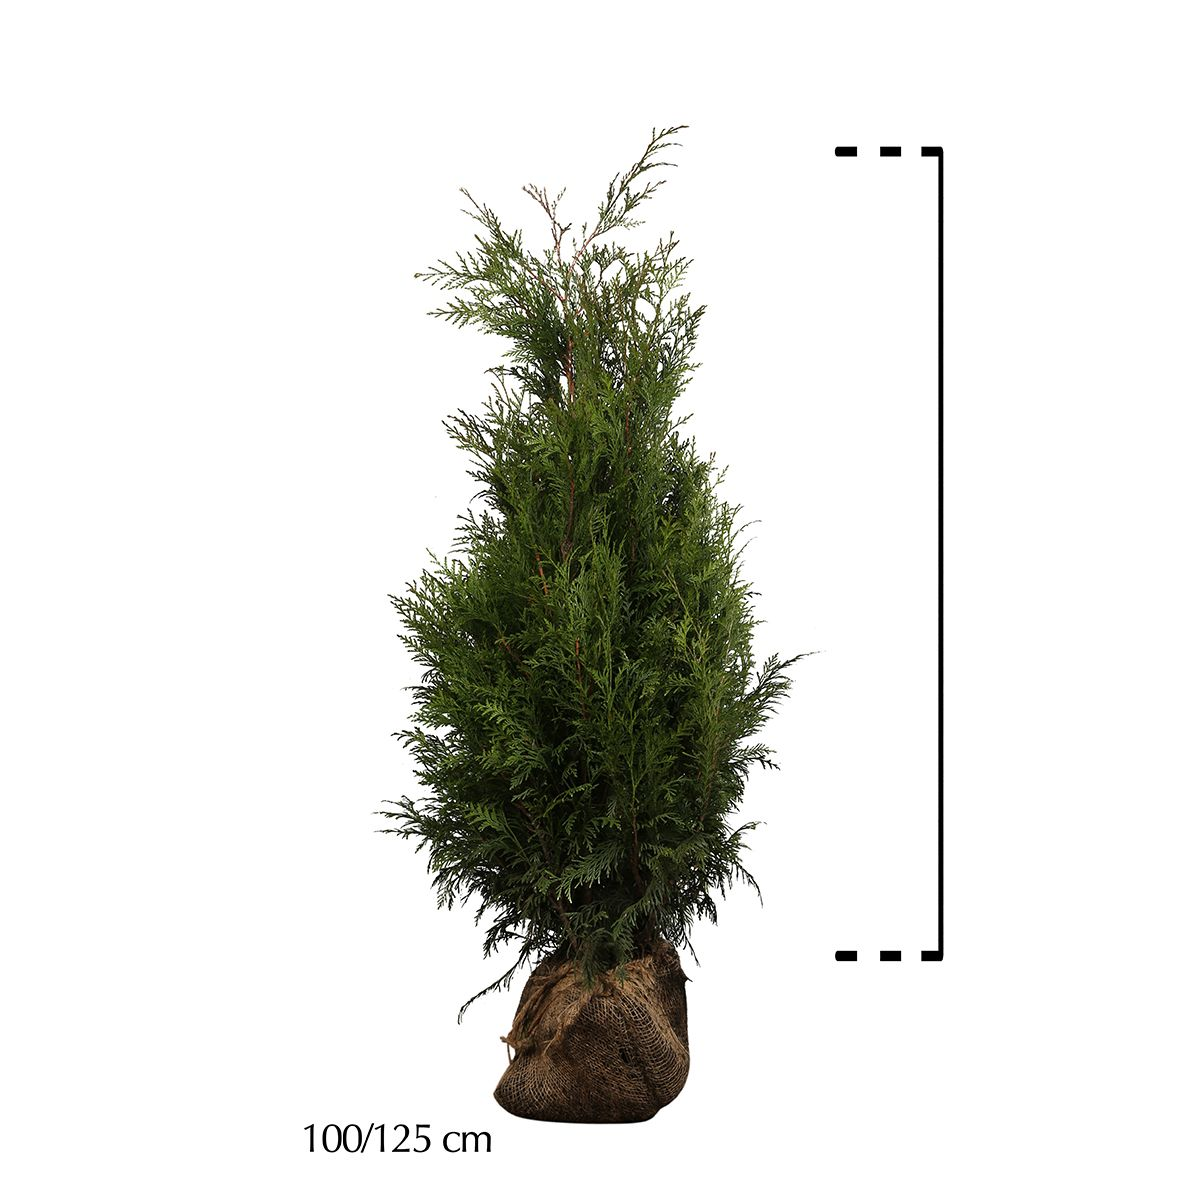 Reuzenlevensboom 'Martin'  Kluit 100-125 cm Extra kwaliteit